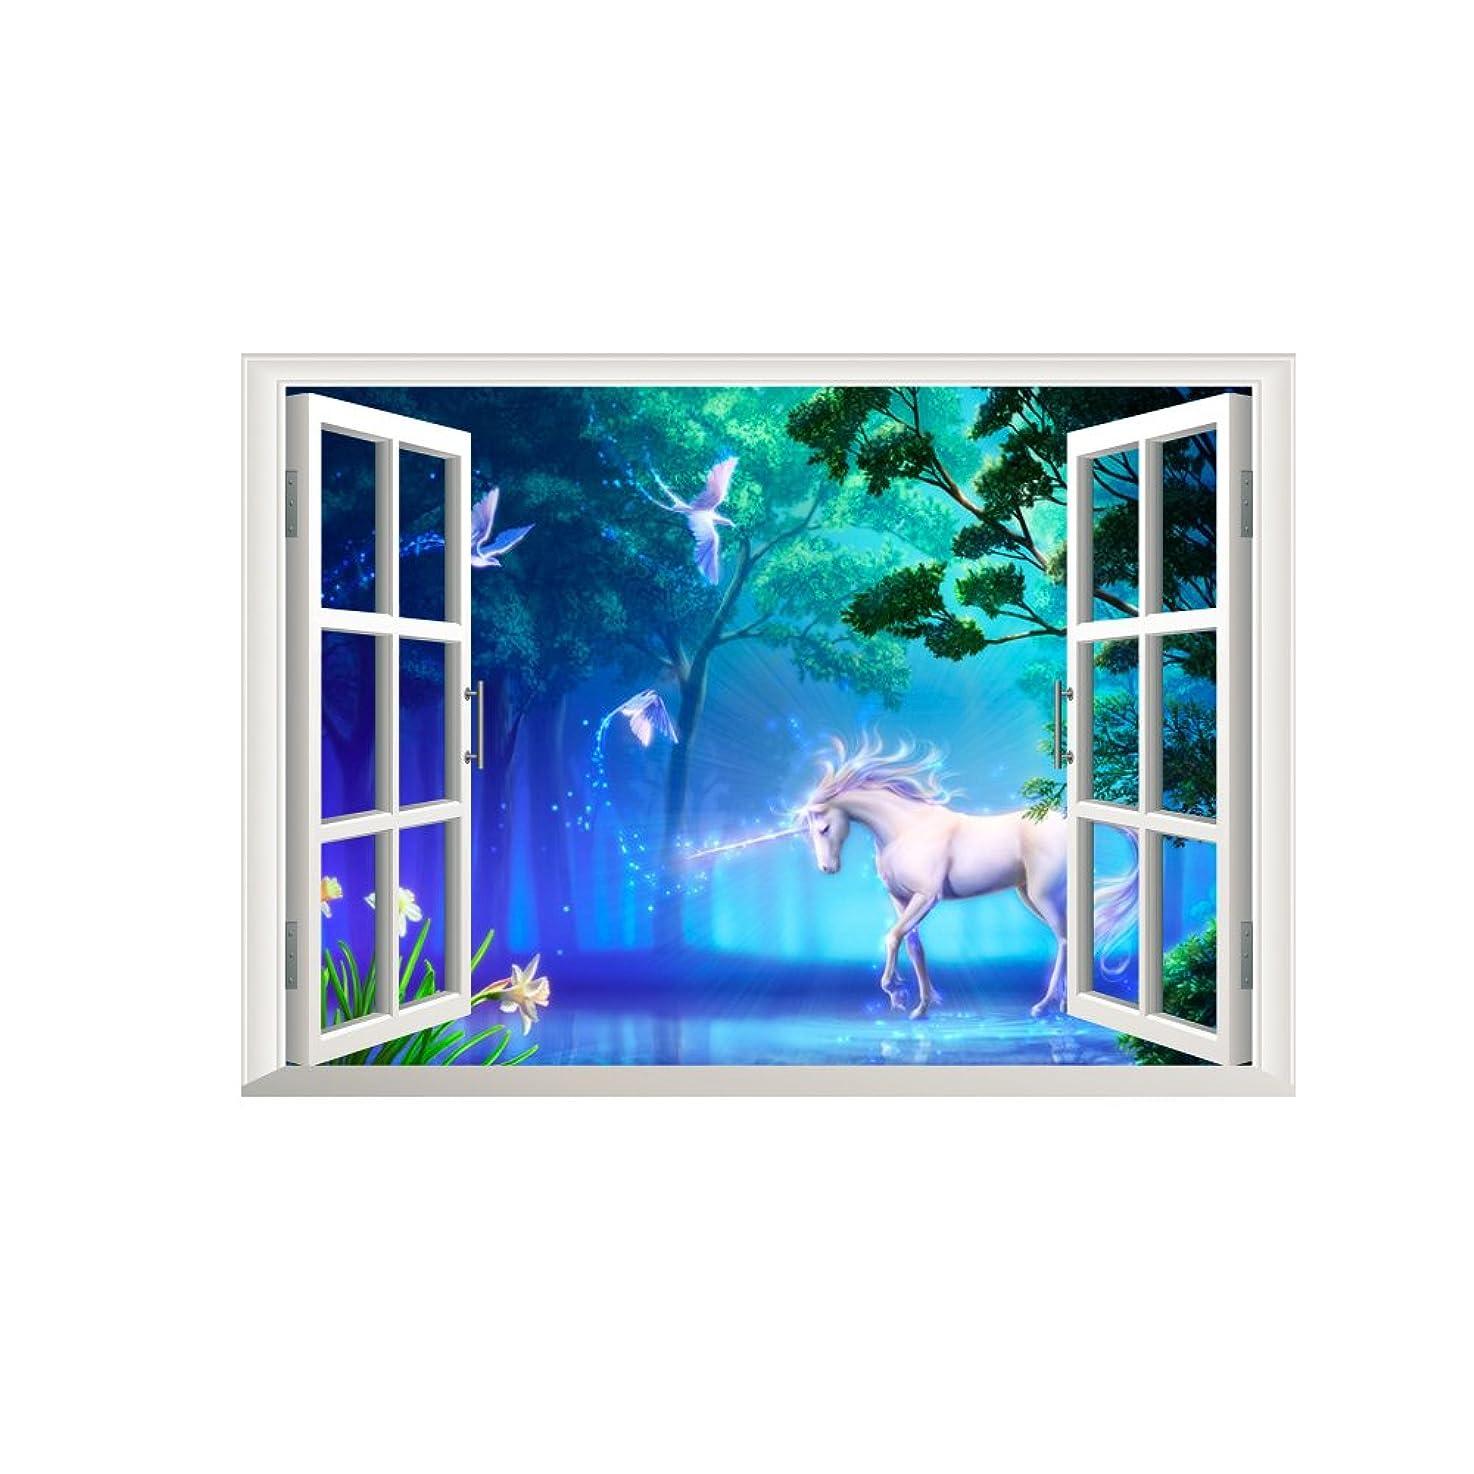 Winhappyhome Unicorn Fake Window Wall Art Decals for Kids Room Nursery Background Decoration Sticker